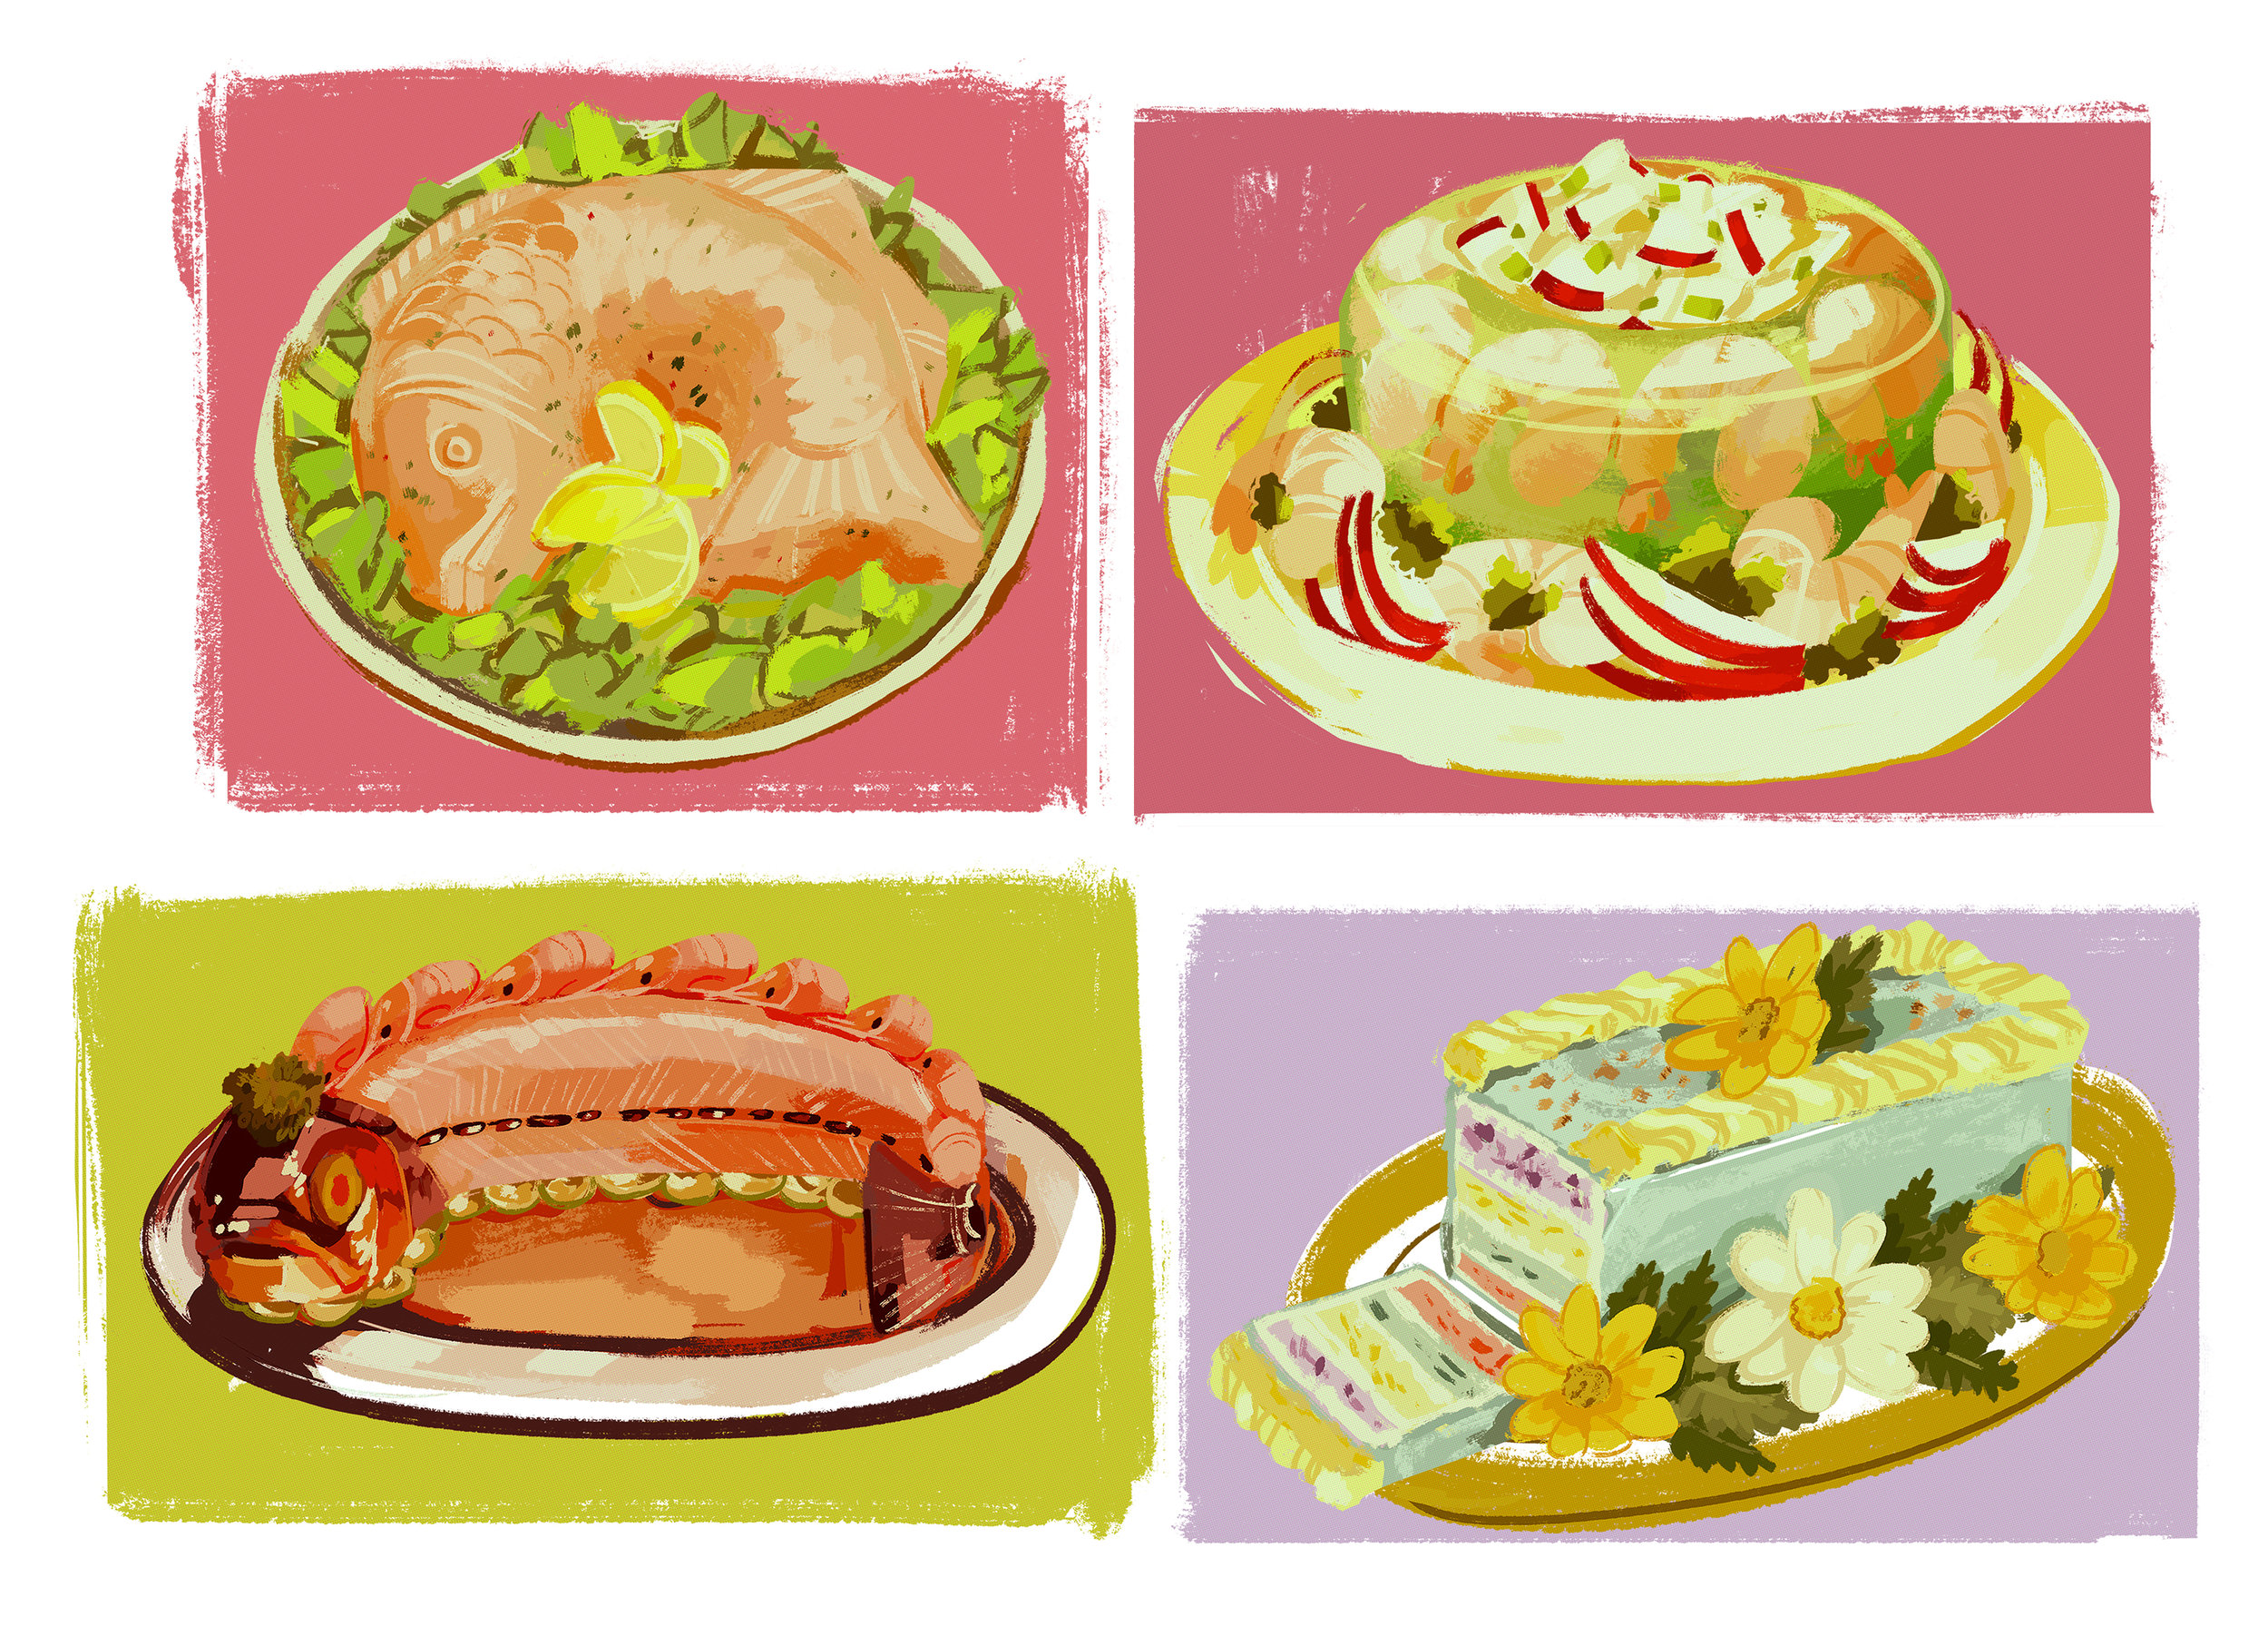 70's foods5 copy.jpg